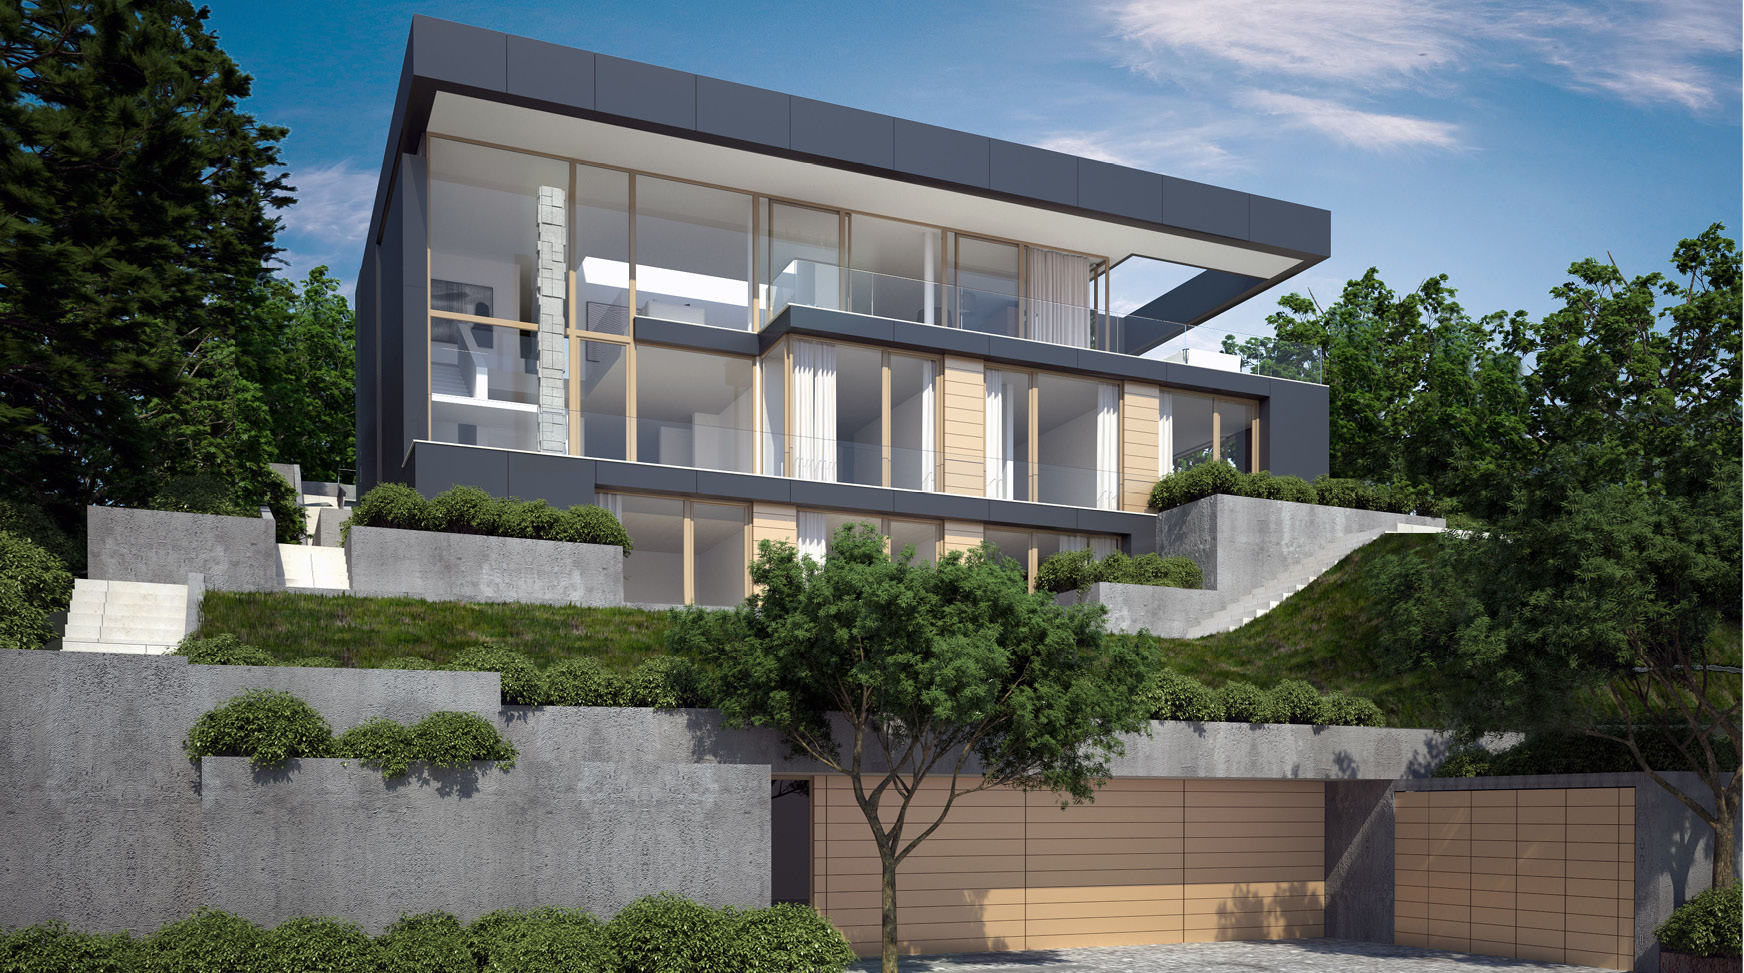 Projekt - Haus am Hang Stuttgart | architekten bda: Fuchs ...